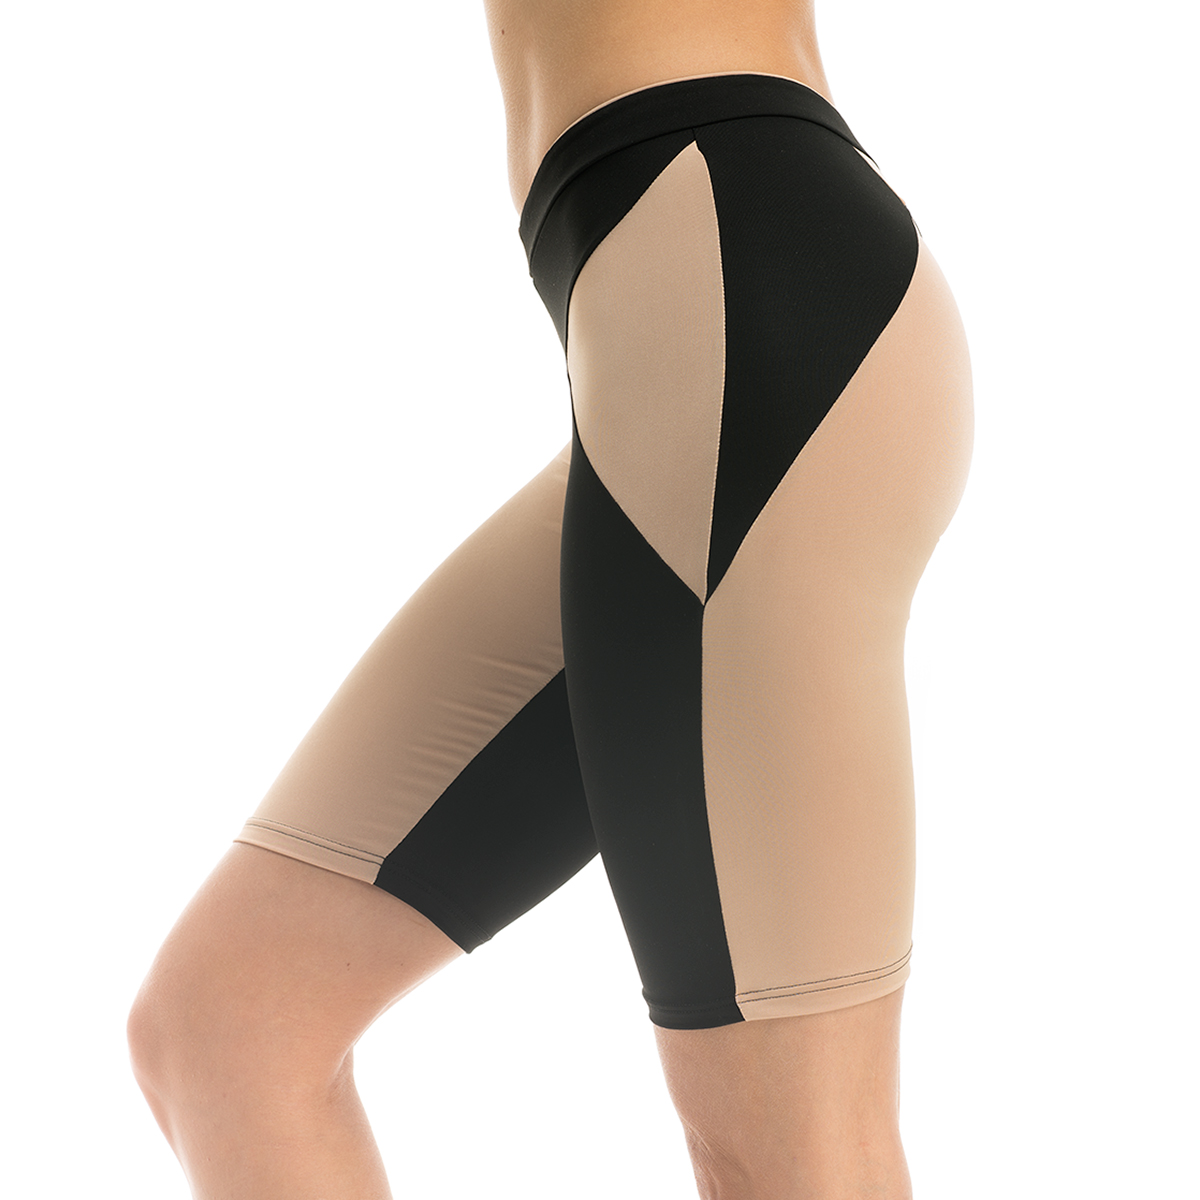 movement-biker-shorts-black-nude01-side.jpg